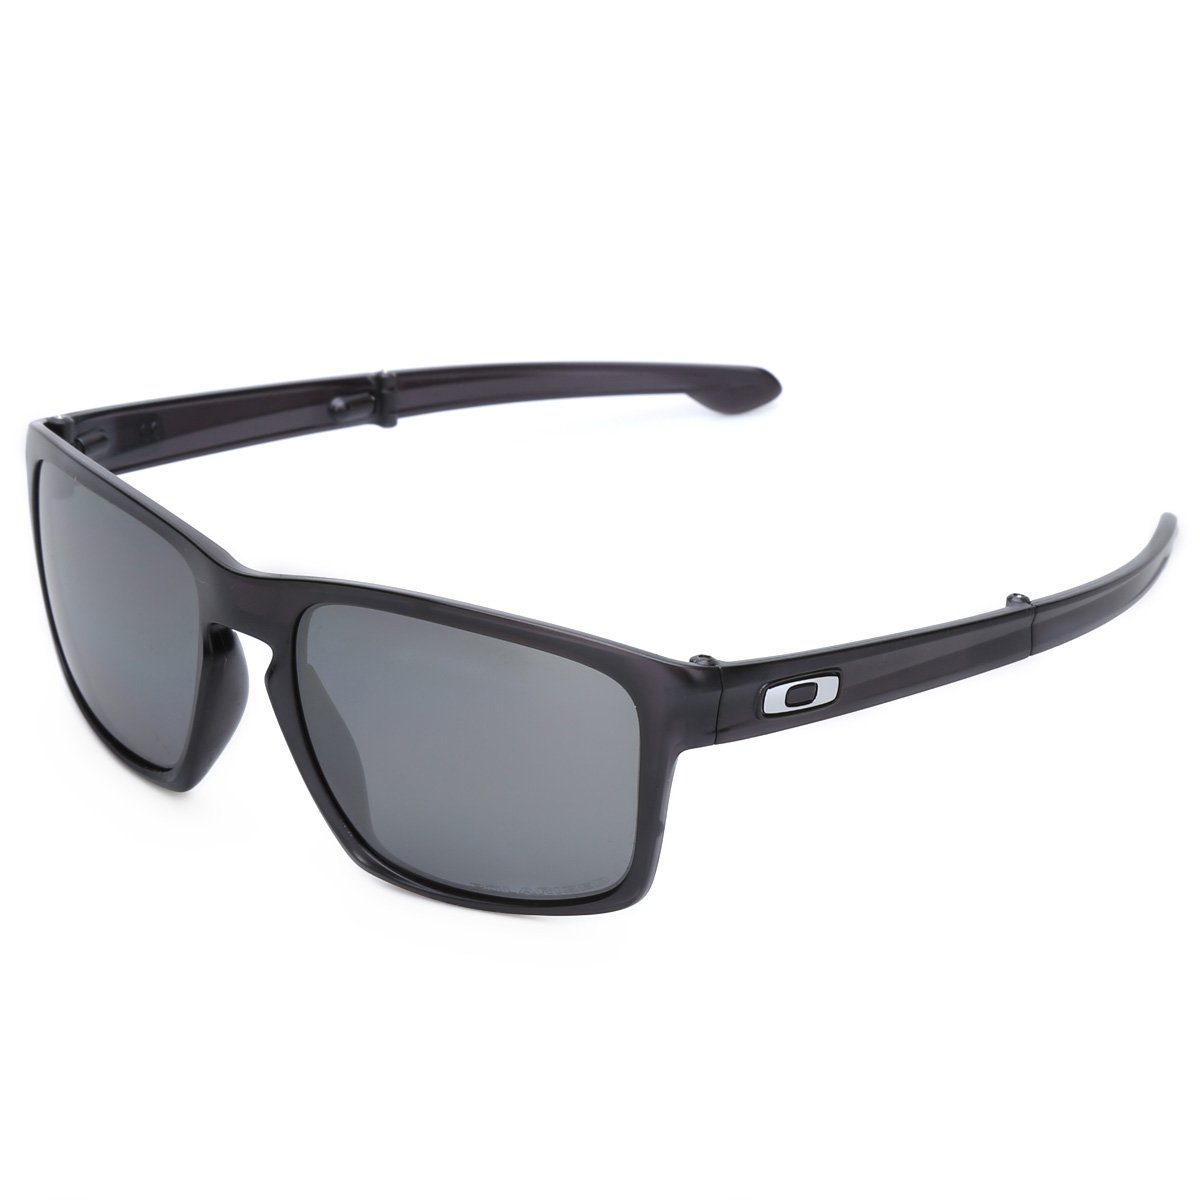 1501047a4107b Óculos de Sol Oakley Sliver F Matte Iridium - Compre Agora